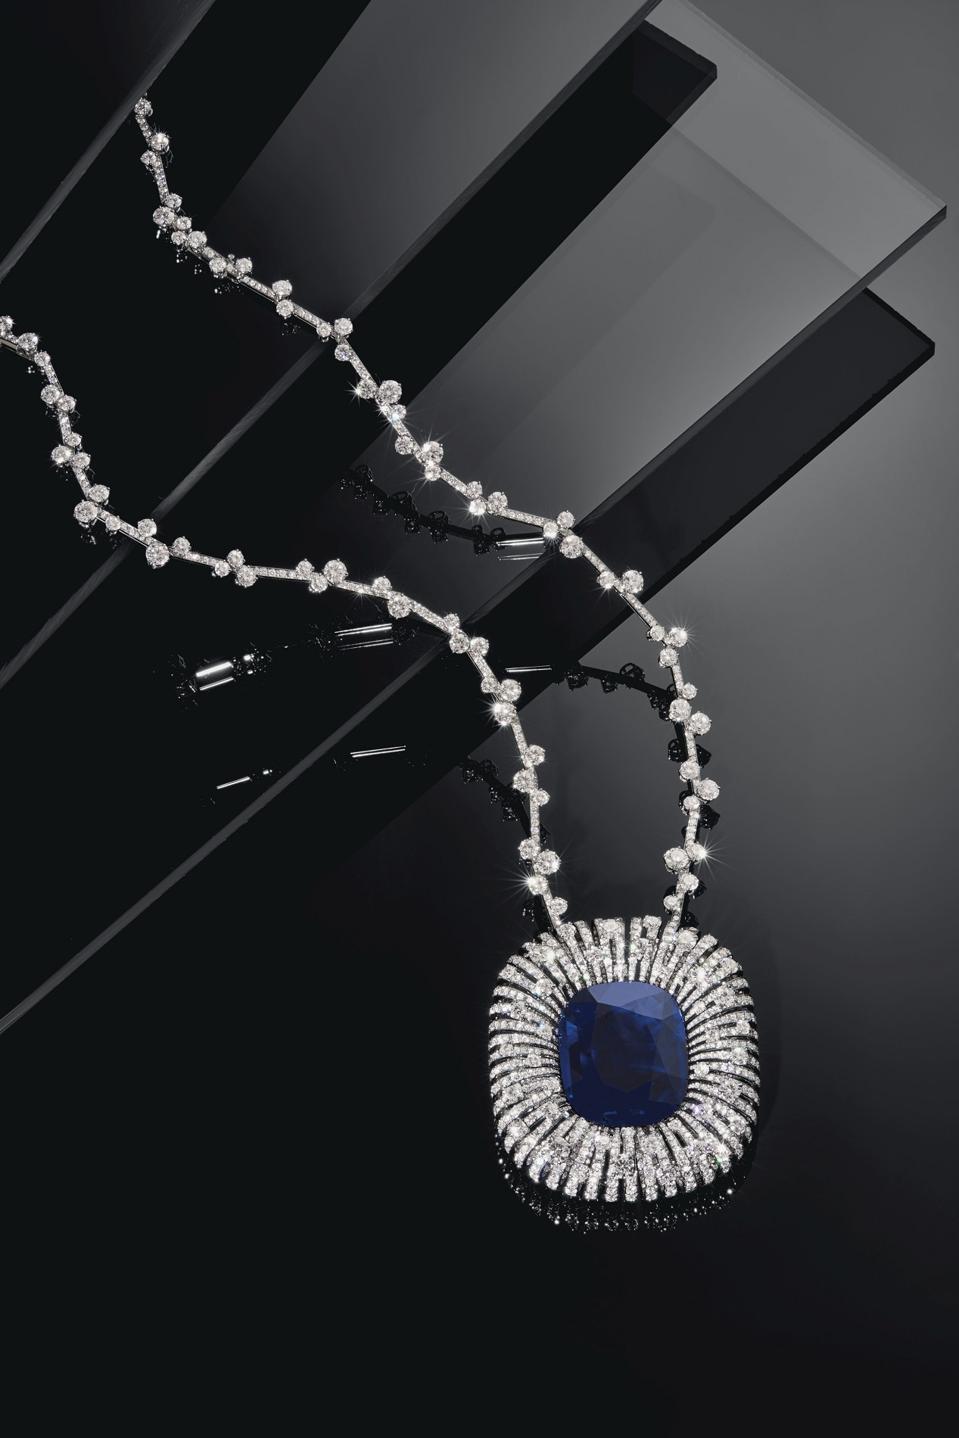 80.86-carat Burma sapphire and diamond necklace